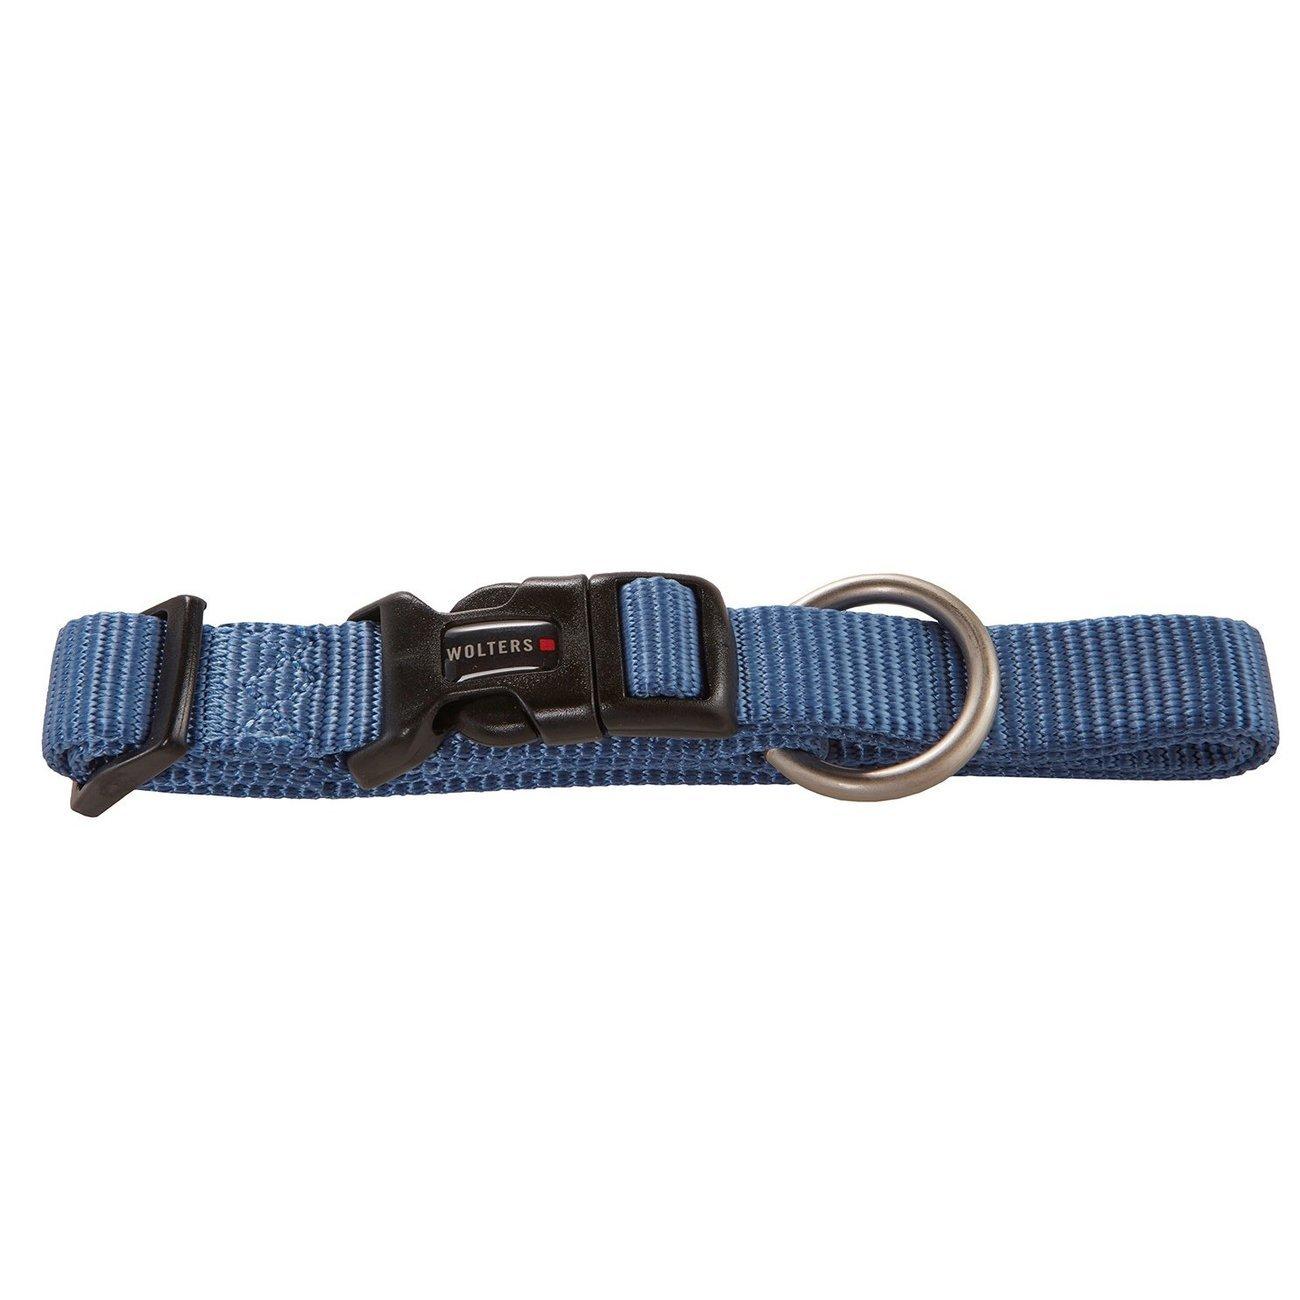 Wolters Halsband Nylon Professional, Bild 11